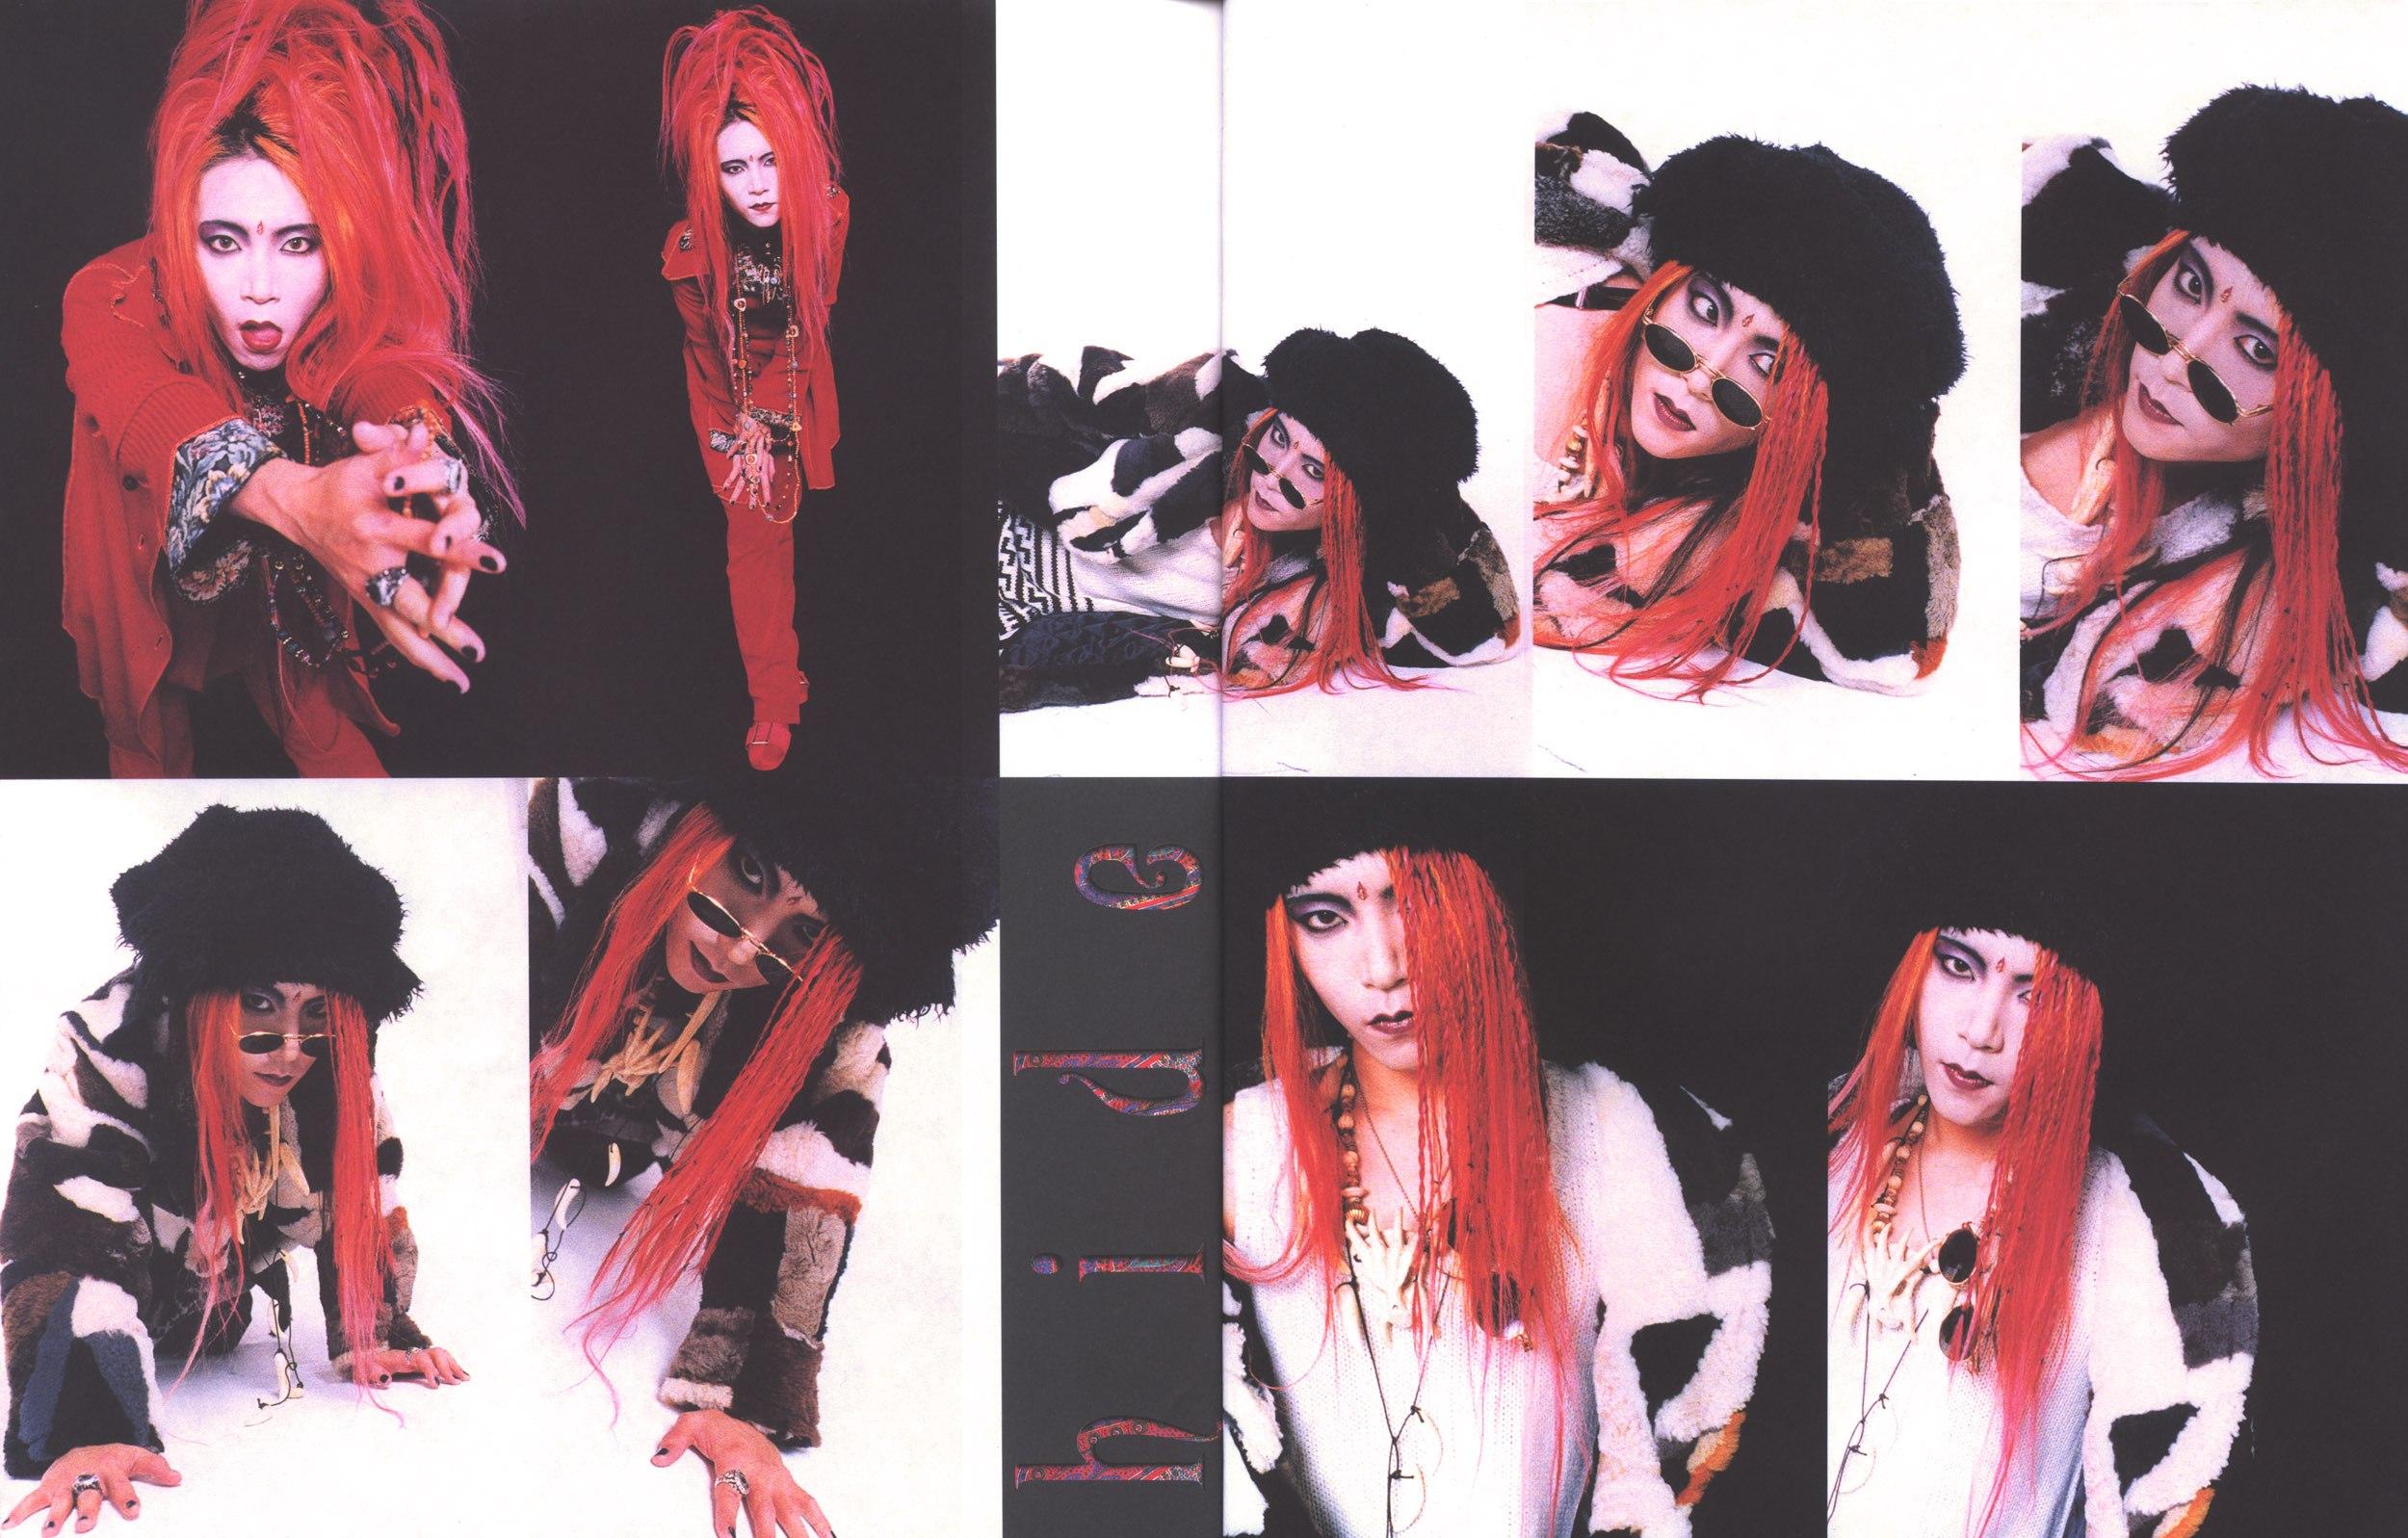 Hide X Japan - Страница 2 Rockit17-hide-5